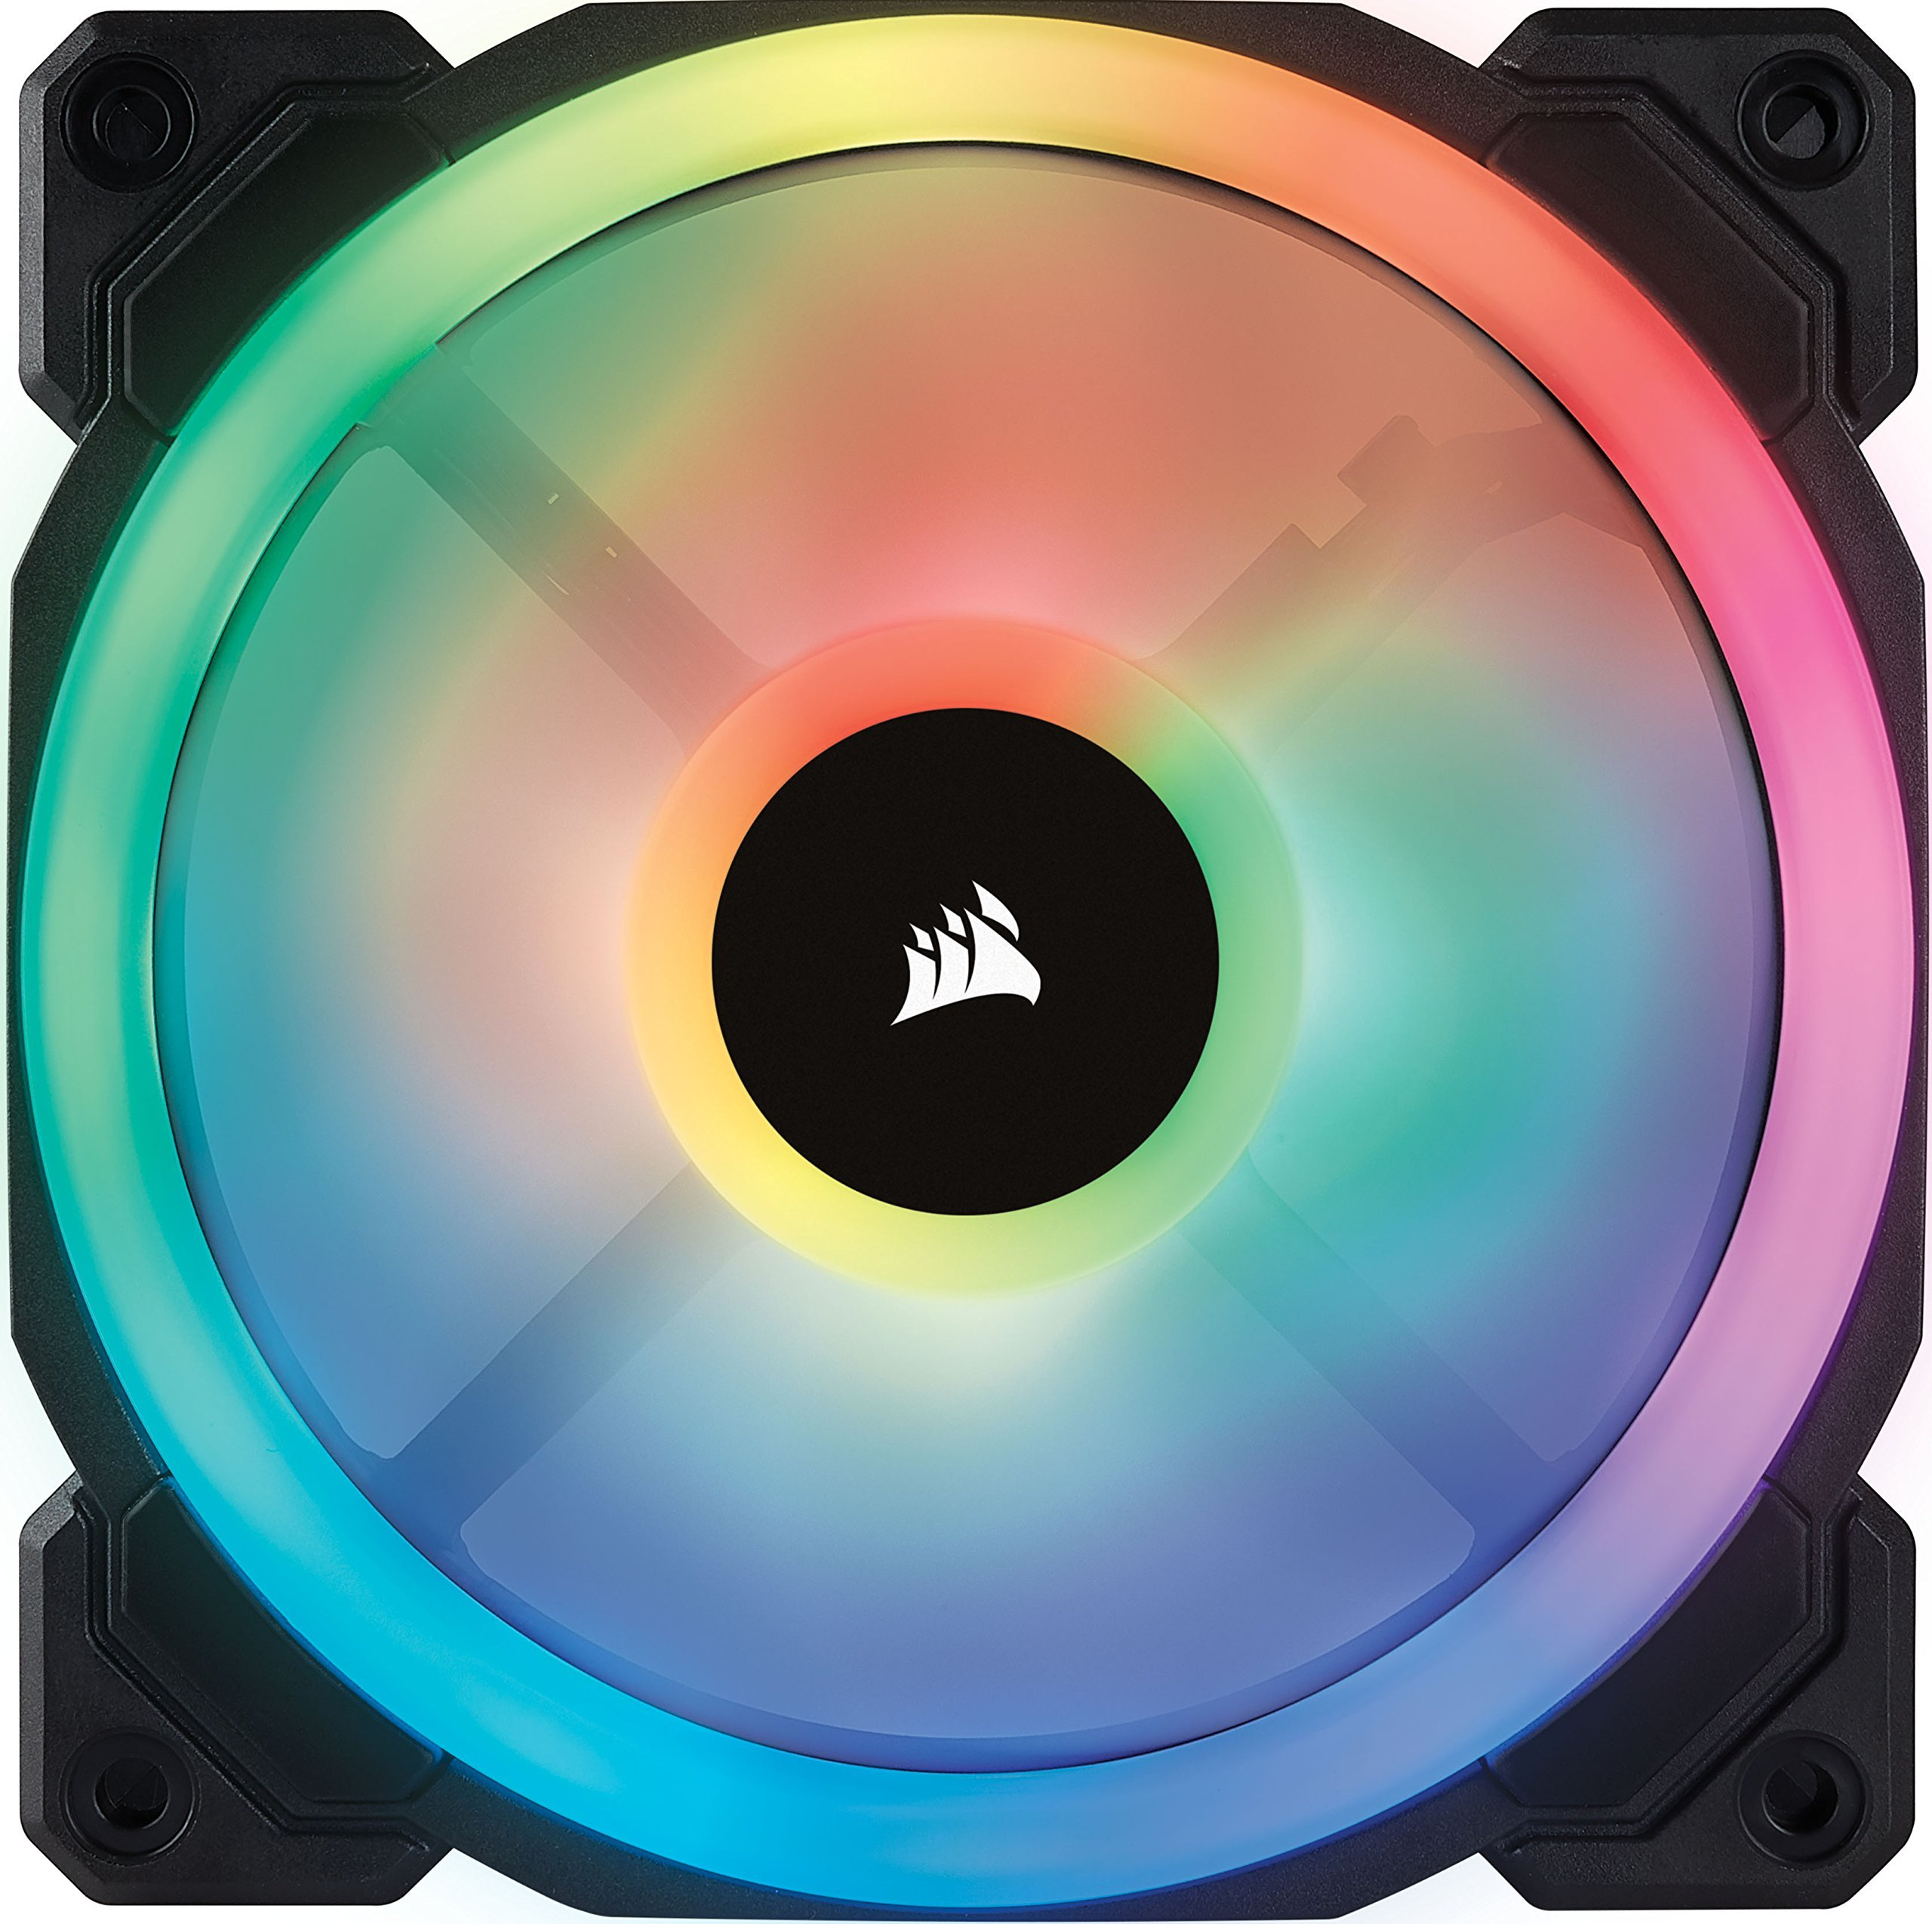 Corsair LL Series LL120 RGB 120mm Dual Light Loop RGB LED PWM Fan 3 Fan Pack with Lighting Node Pro (Renewed) by Corsair (Image #2)